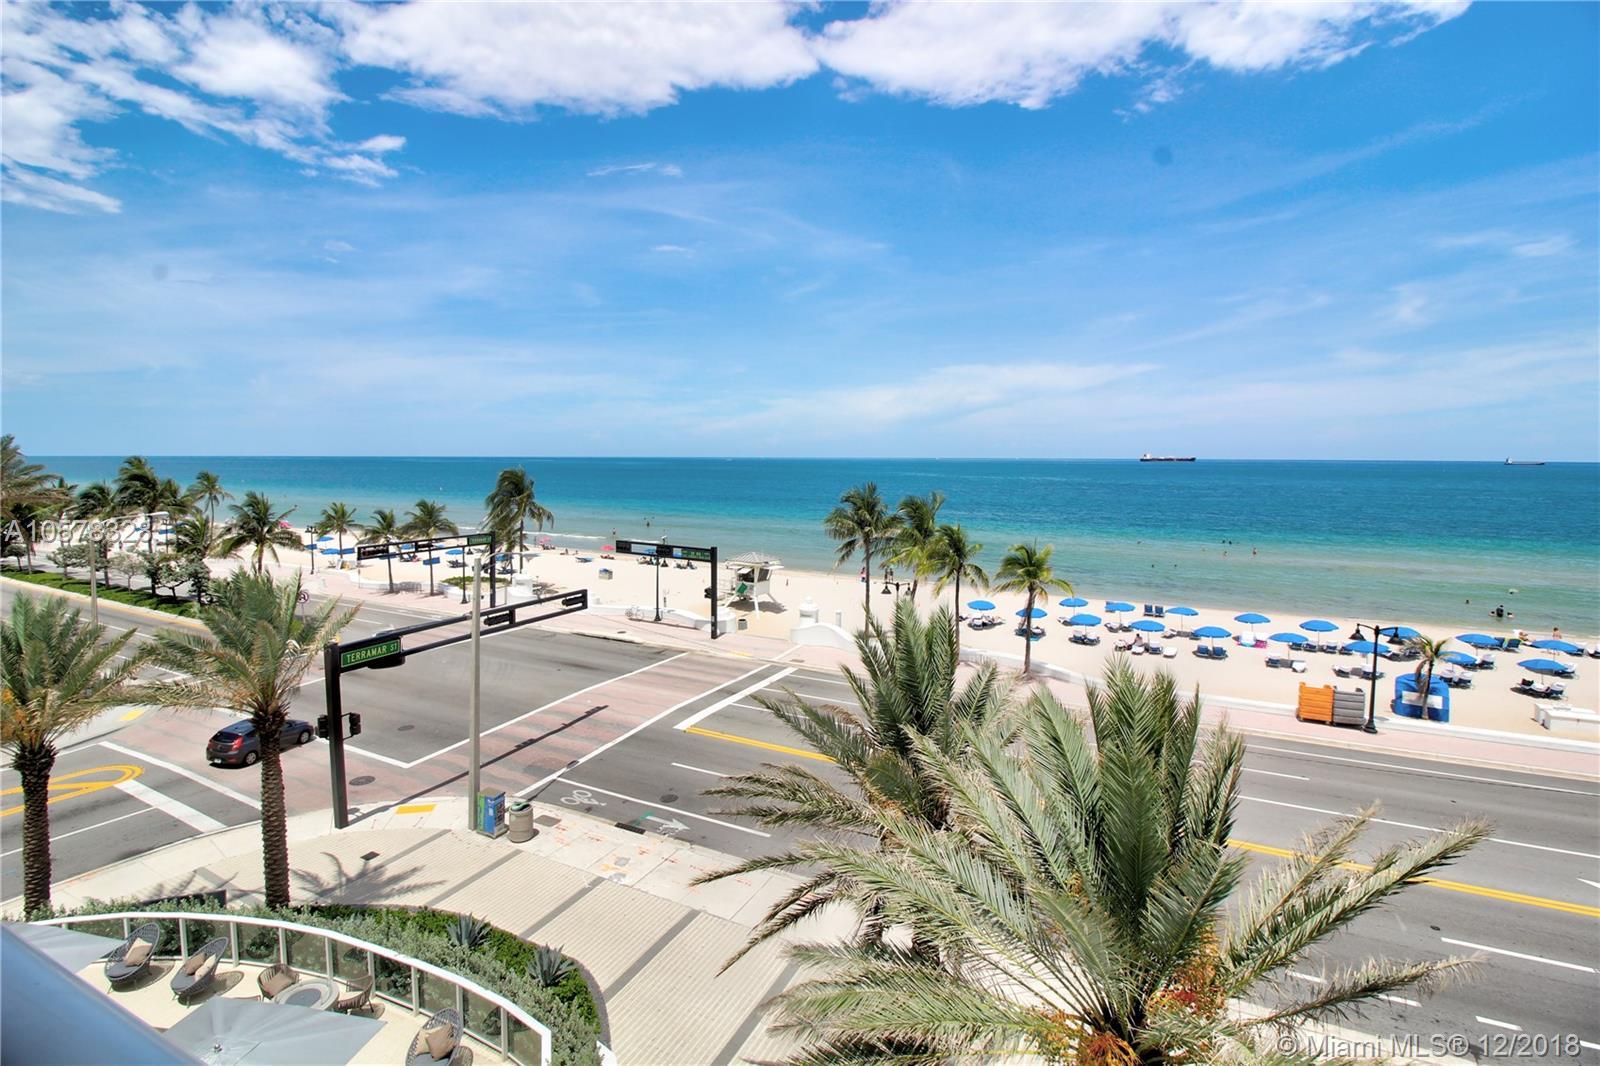 551 N Fort Lauderdale Beach Blvd #R501 For Sale A10578328, FL